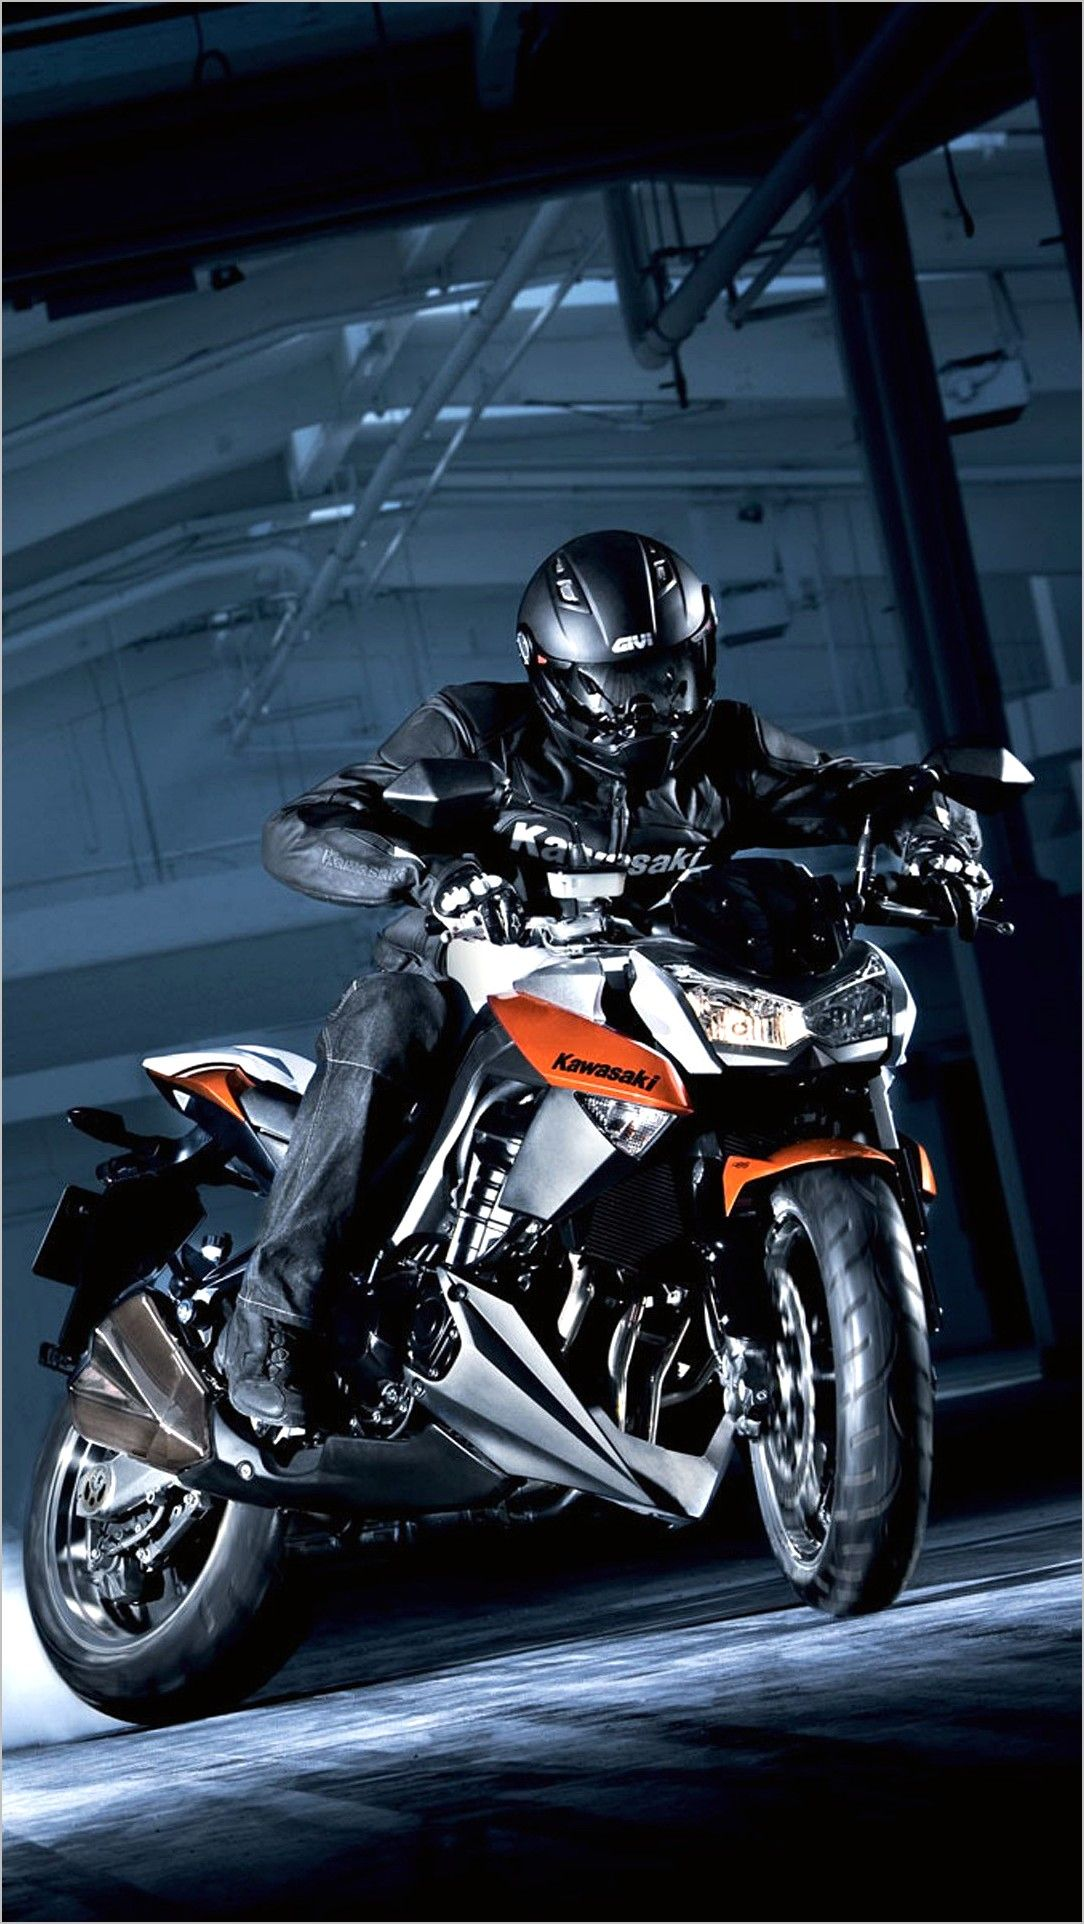 4k Wallpaper Hubless Motorcycle in 2020 Motorcycle